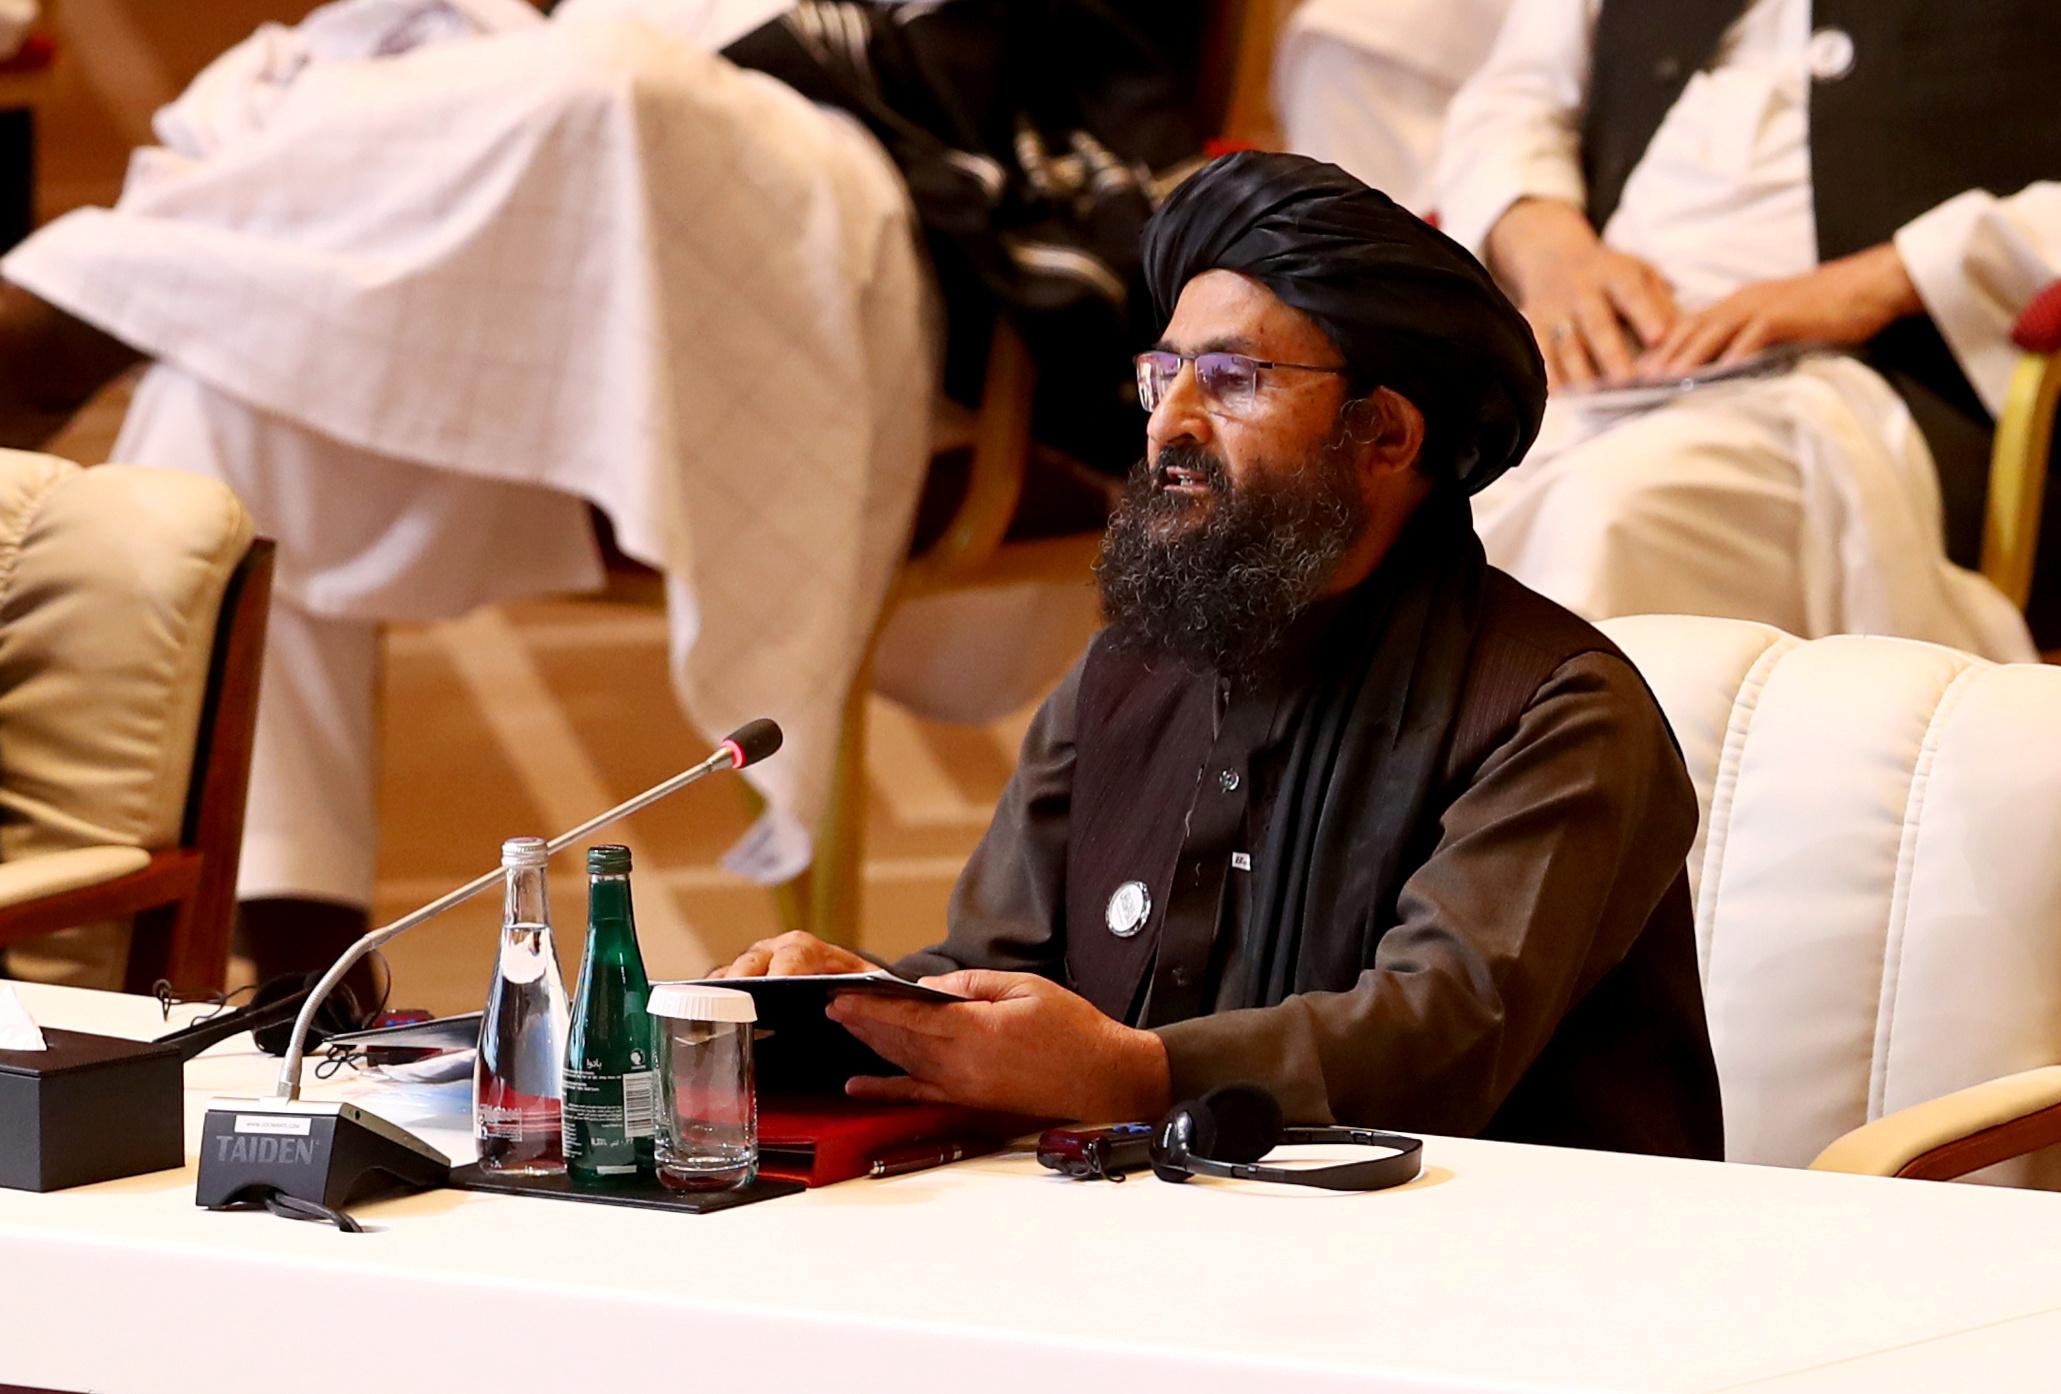 Mullah Abdul Ghani Baradar, the leader of the Taliban delegation, speaks during talks between the Afghan government and Taliban insurgents in Doha, Qatar September 12, 2020. REUTERS/Ibraheem al Omari